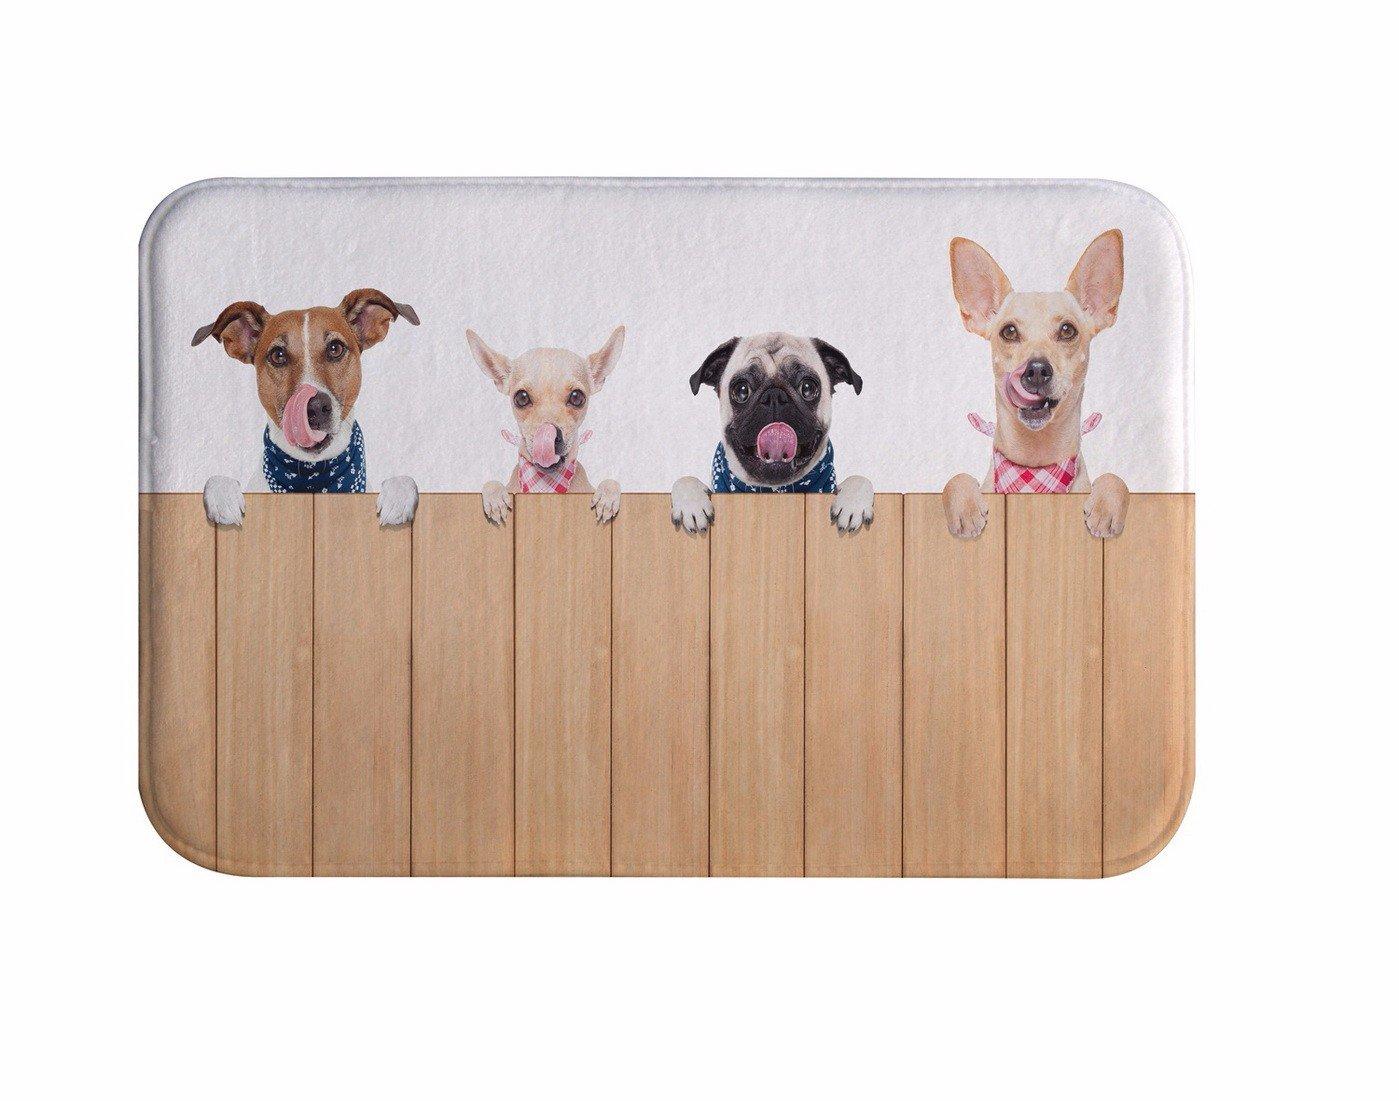 A.Monamour Cute Dog Pets Animal Lover Theme Print Soft Flannel Non-Slip Bathroom Shower Bath Rugs Mats Machine Washable 40x60cm / 16''x24''